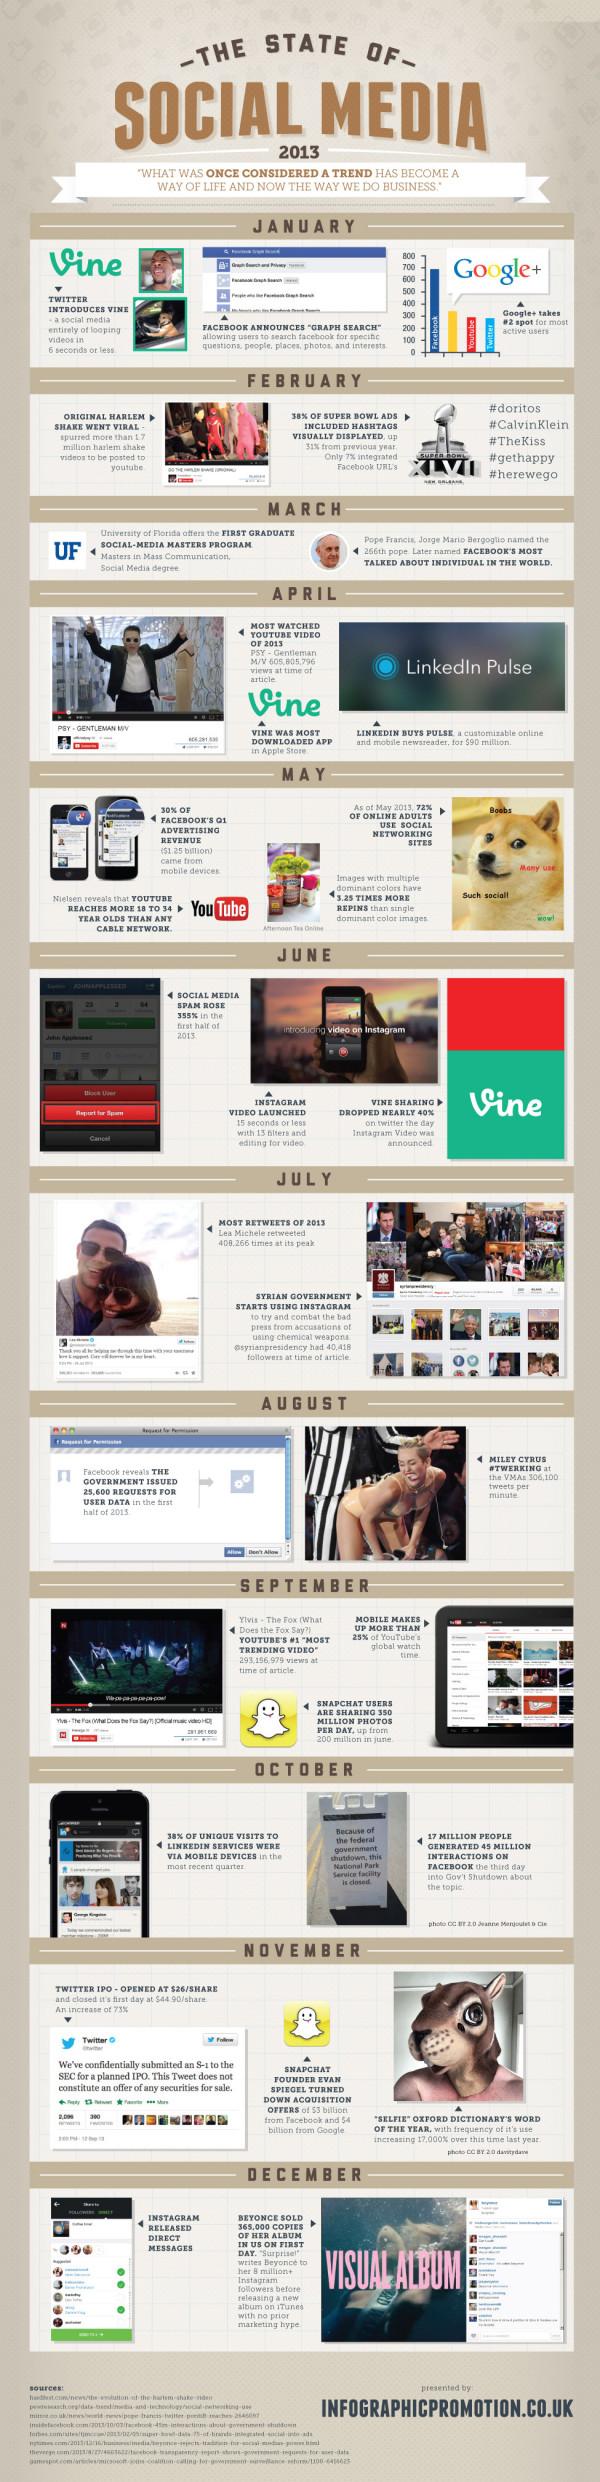 State of social media 2013